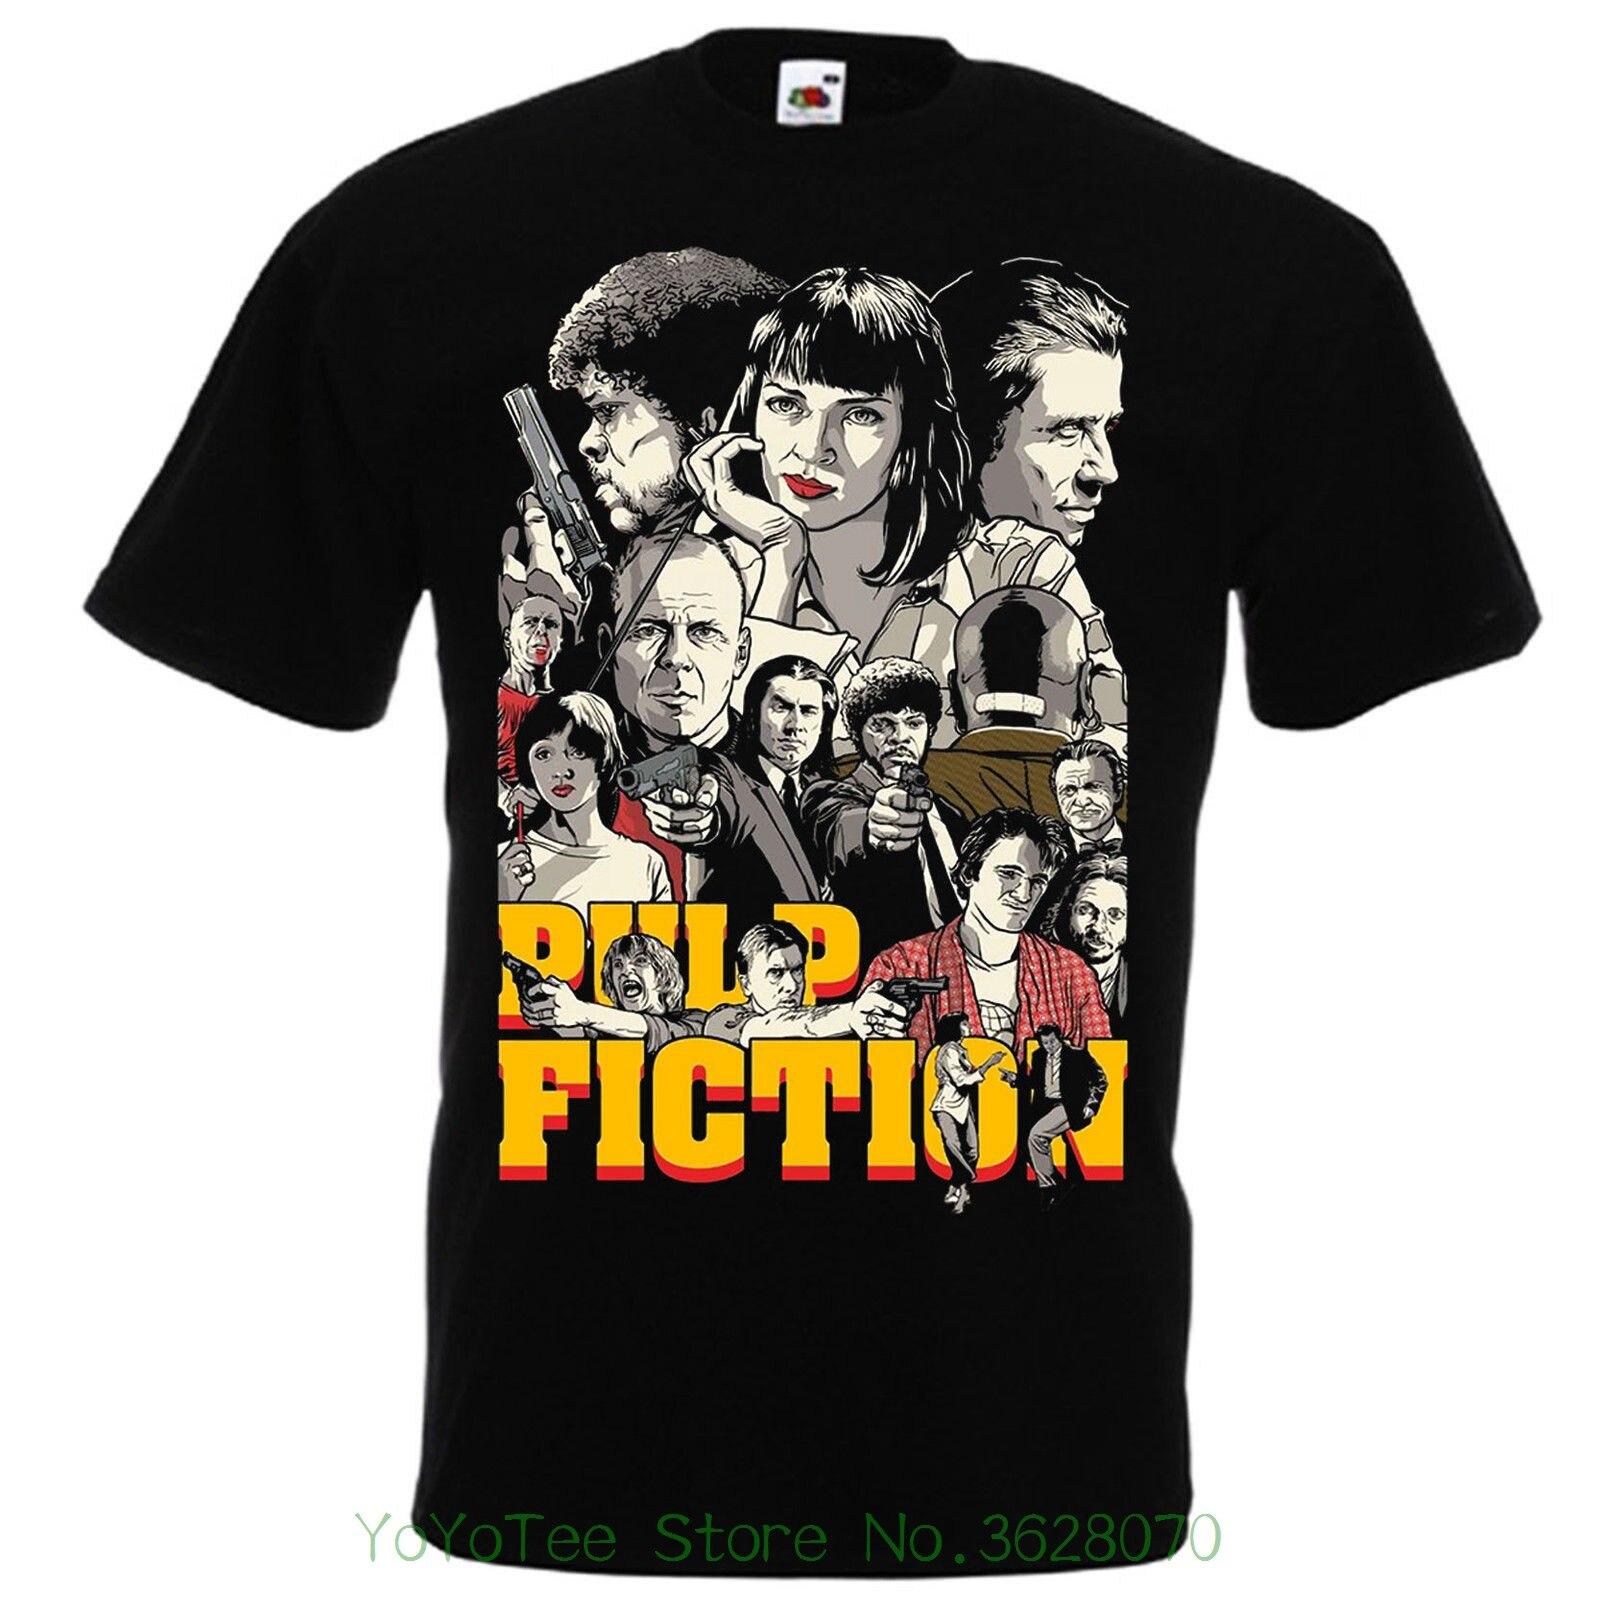 fashion-t-shirts-slim-fit-o-neck-pulp-fiction-black-t-shirt-quentin-font-b-tarantino-b-font--039-94-john-travolta-samuel-l-jackson